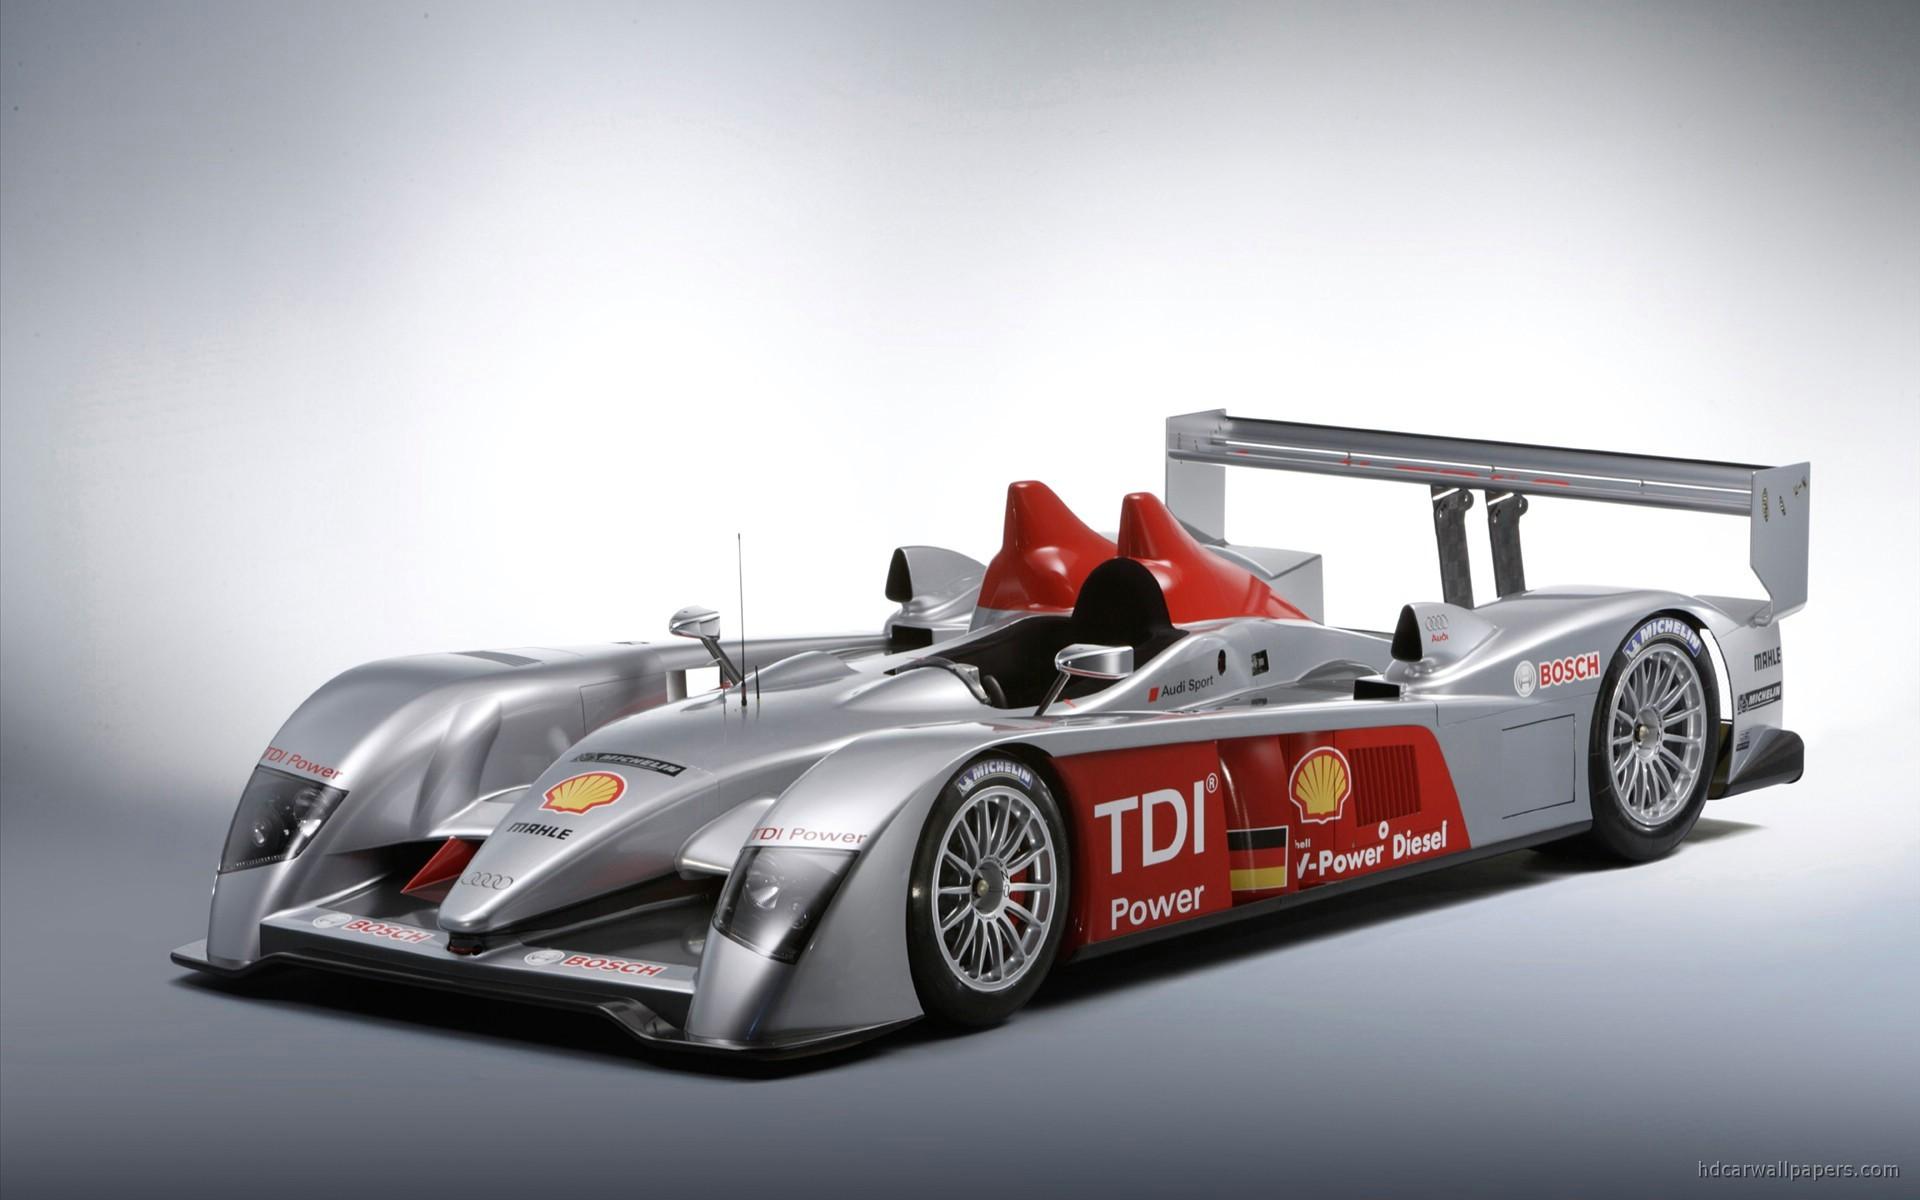 Audi R10 Le Mans Race Car Wallpaper Hd Car Wallpapers